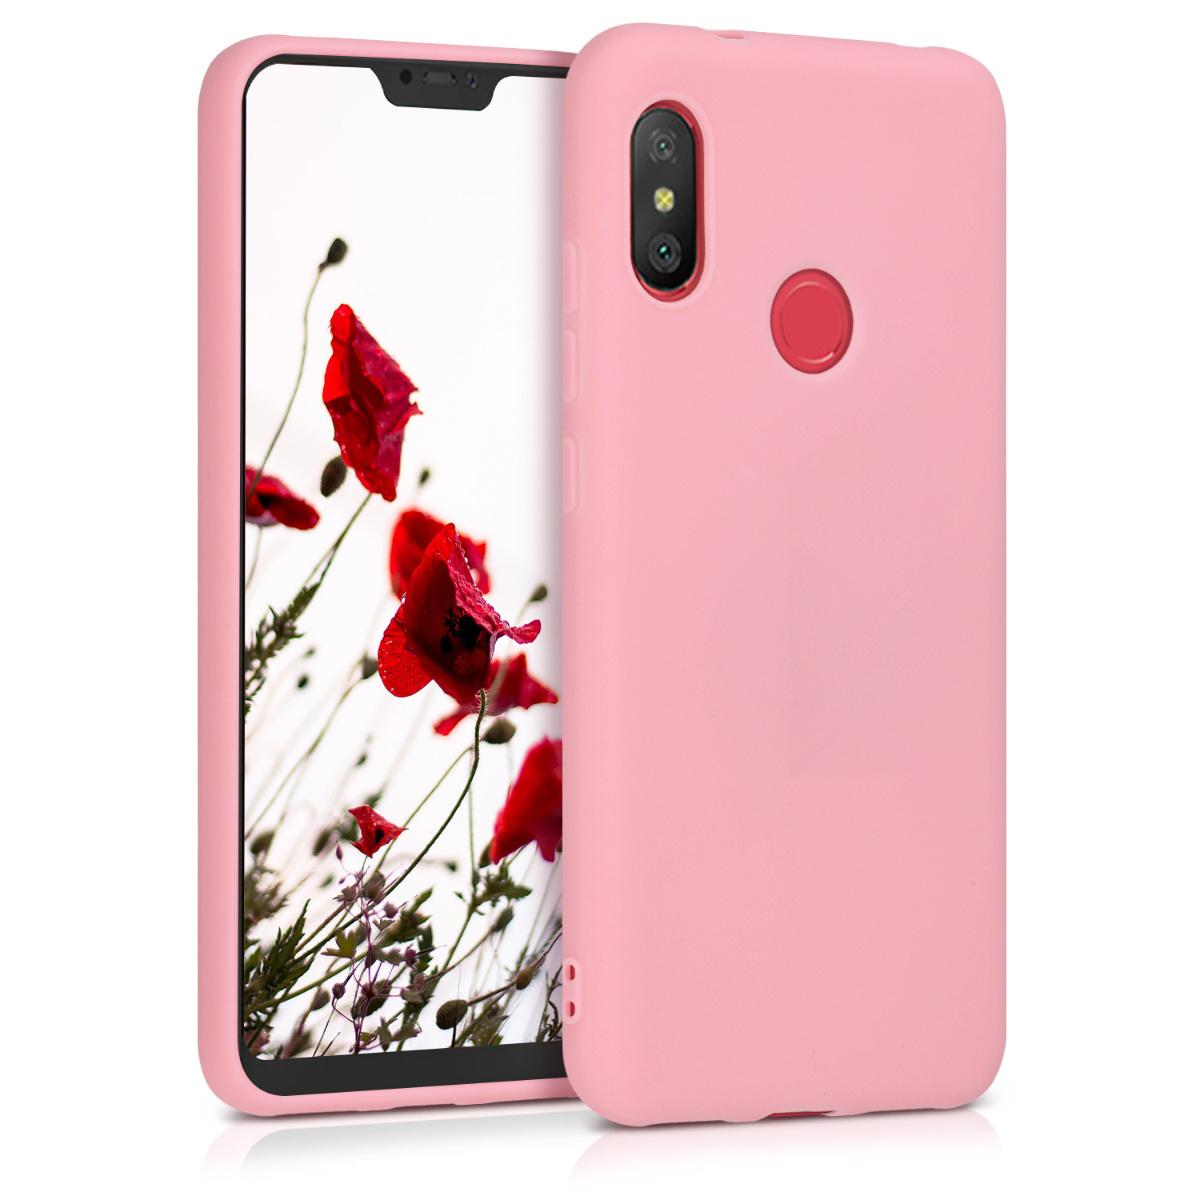 KW Θήκη Σιλικόνης Xiaomi Mi A2 Lite / Redmi 6 Pro - Light Pink Matte (45617.63)